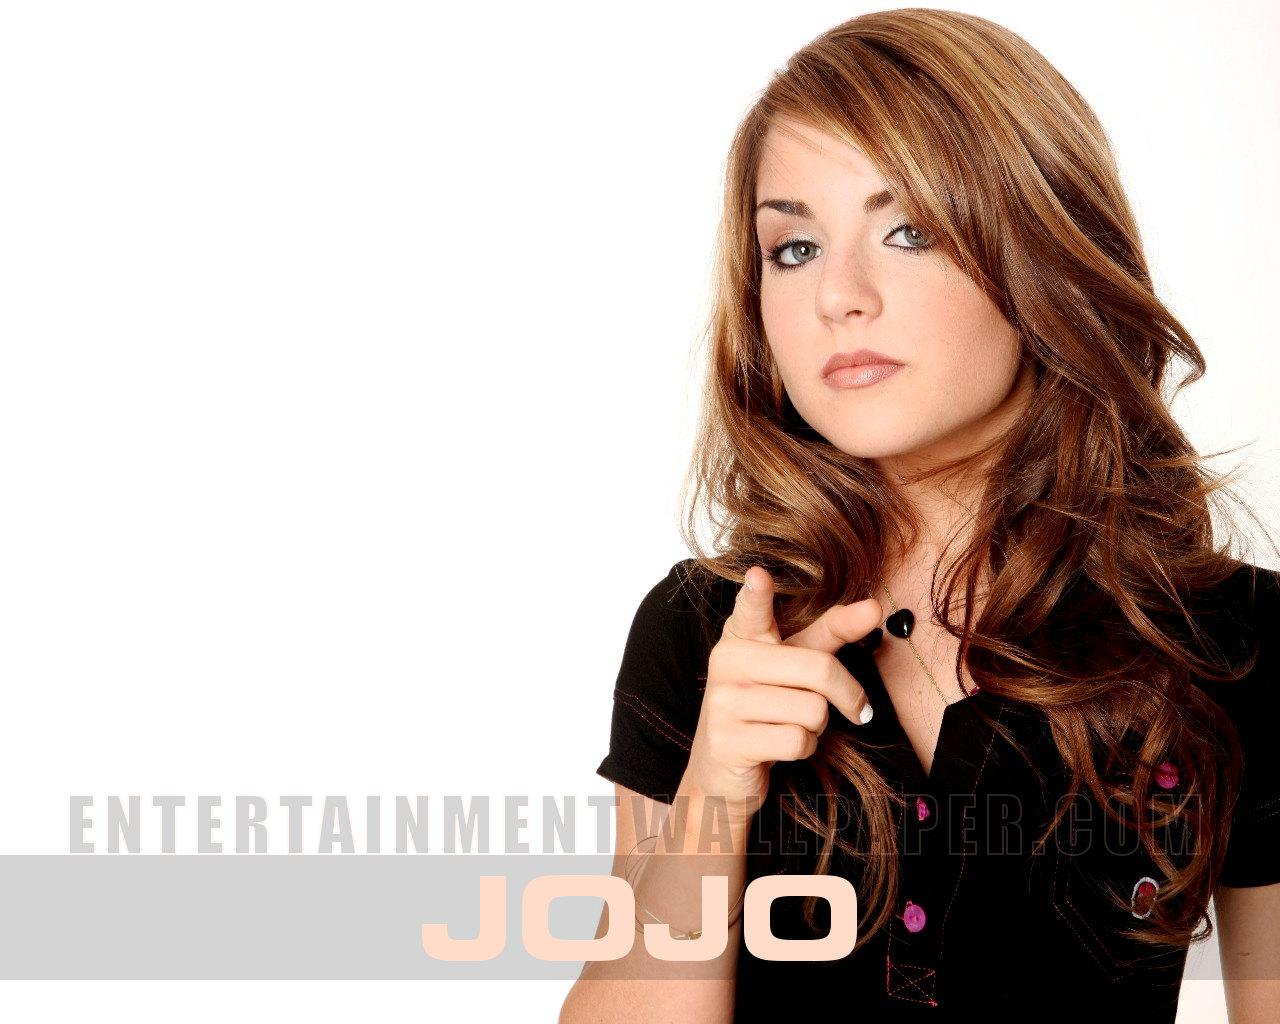 JoJo Wallpaper - Original size, download now.